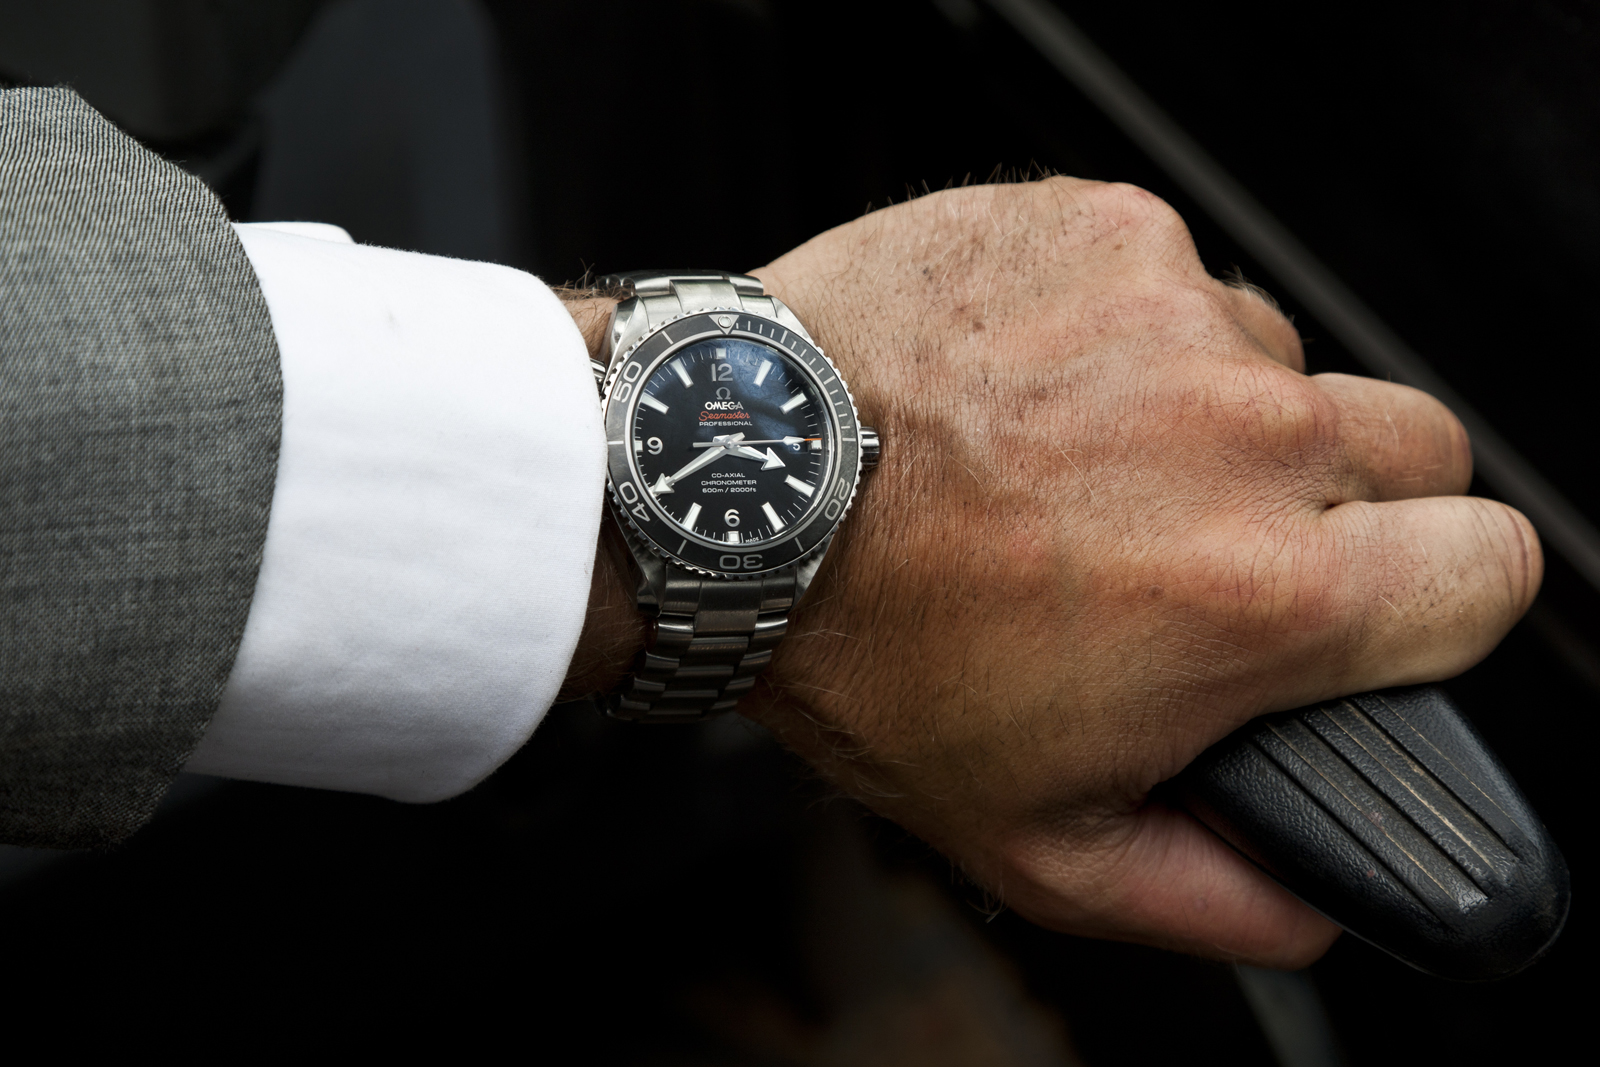 James Bond (Skyfall) Wristshot of the Omega Seamaster Planet Ocean